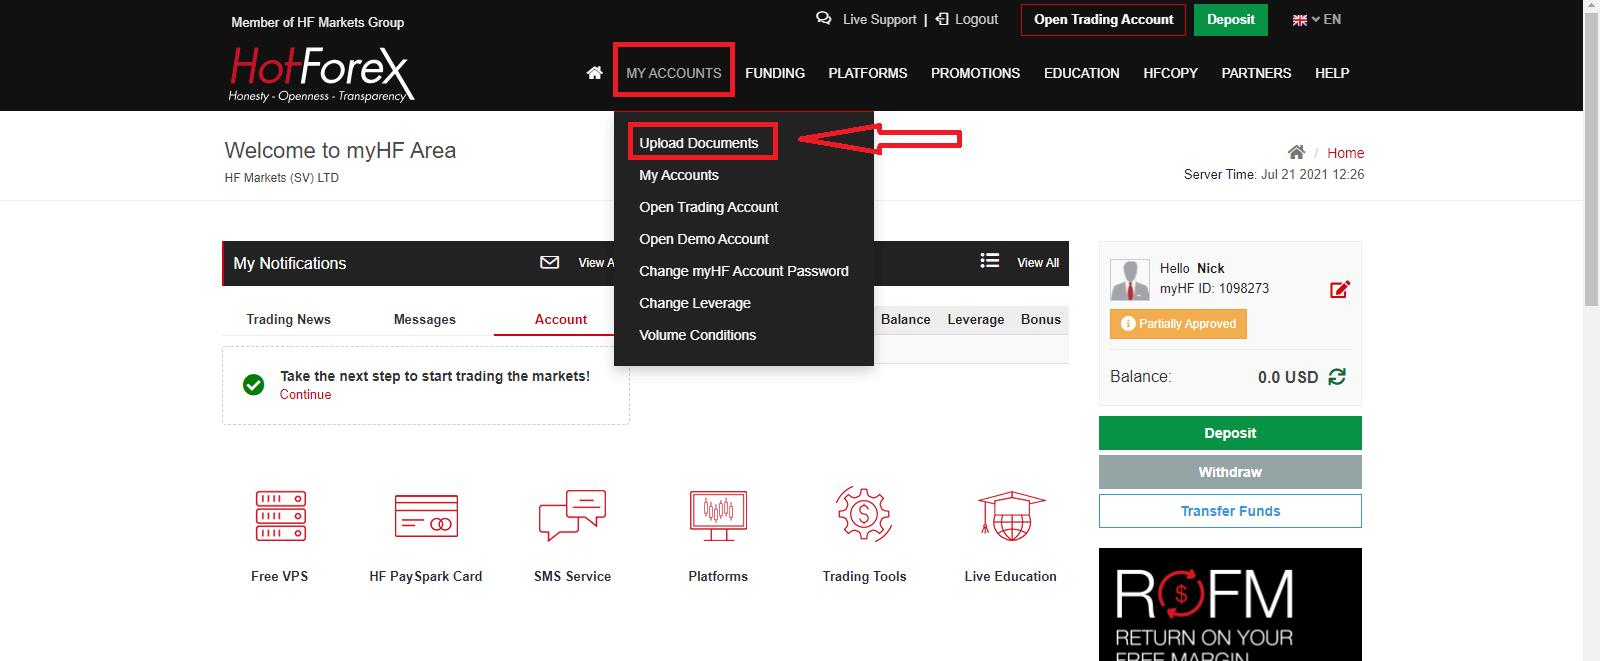 How to Verify HotForex Account